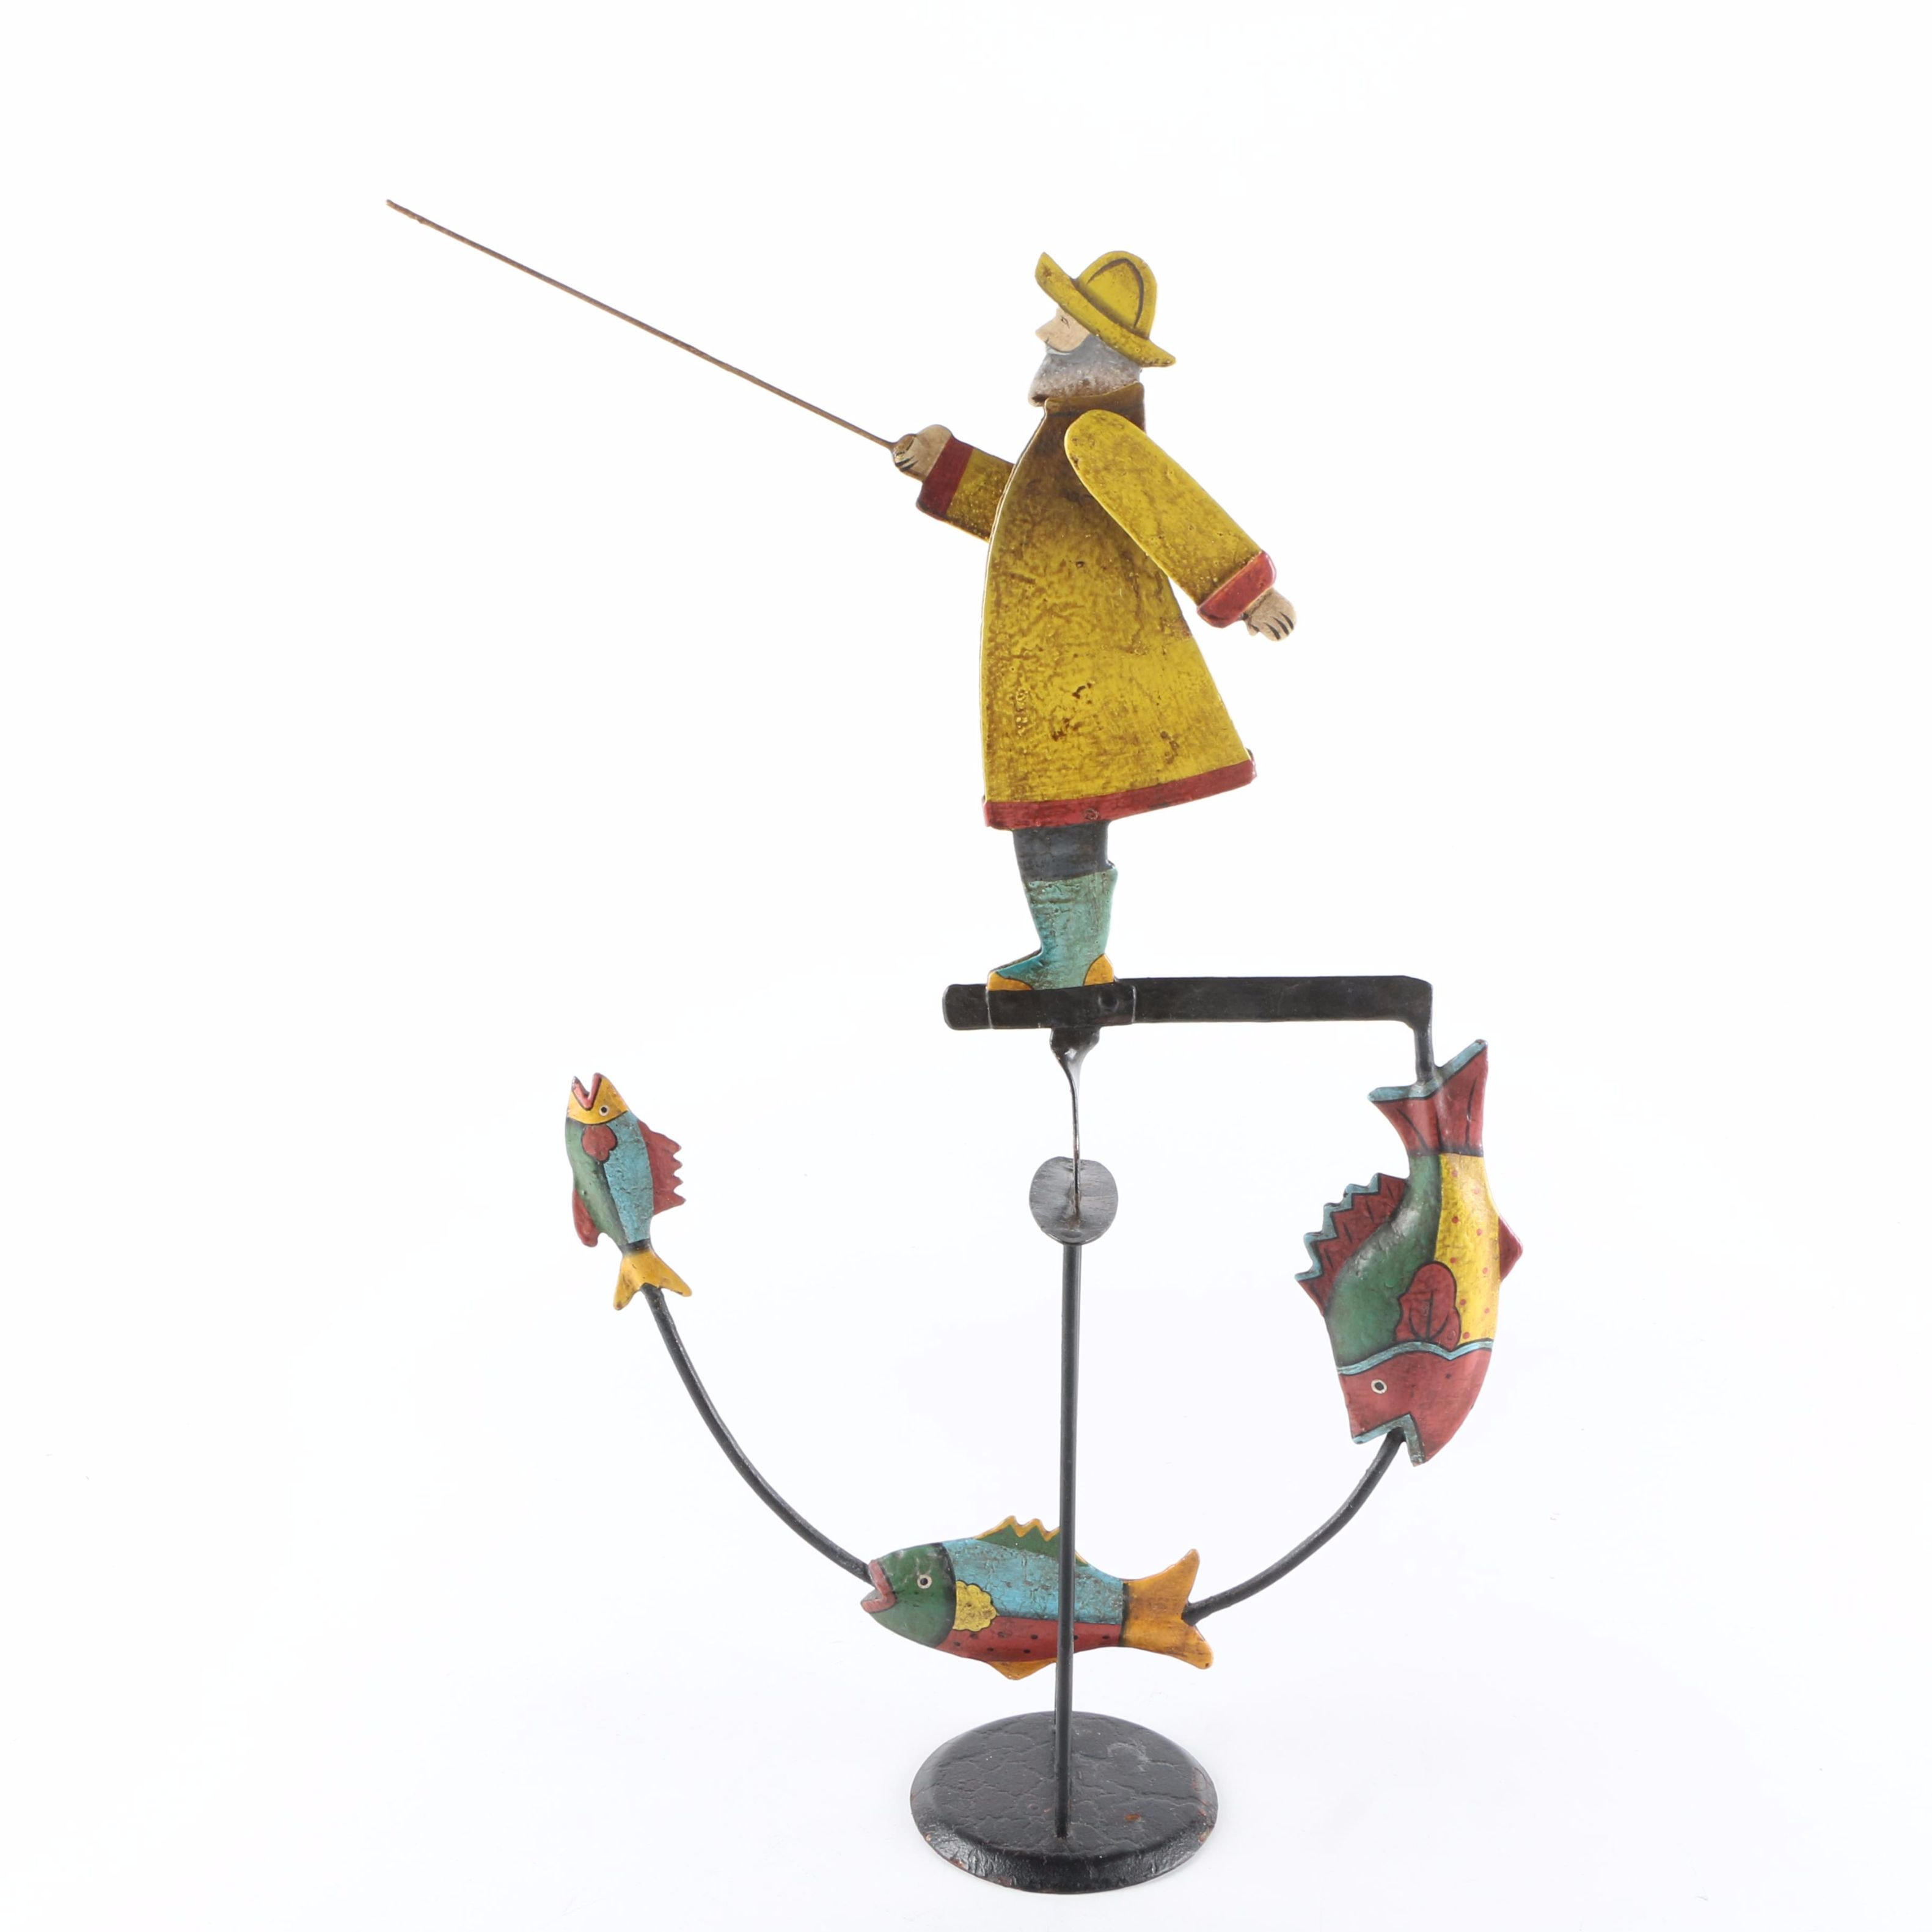 Fishing Themed Metal Kinetic Sculpture